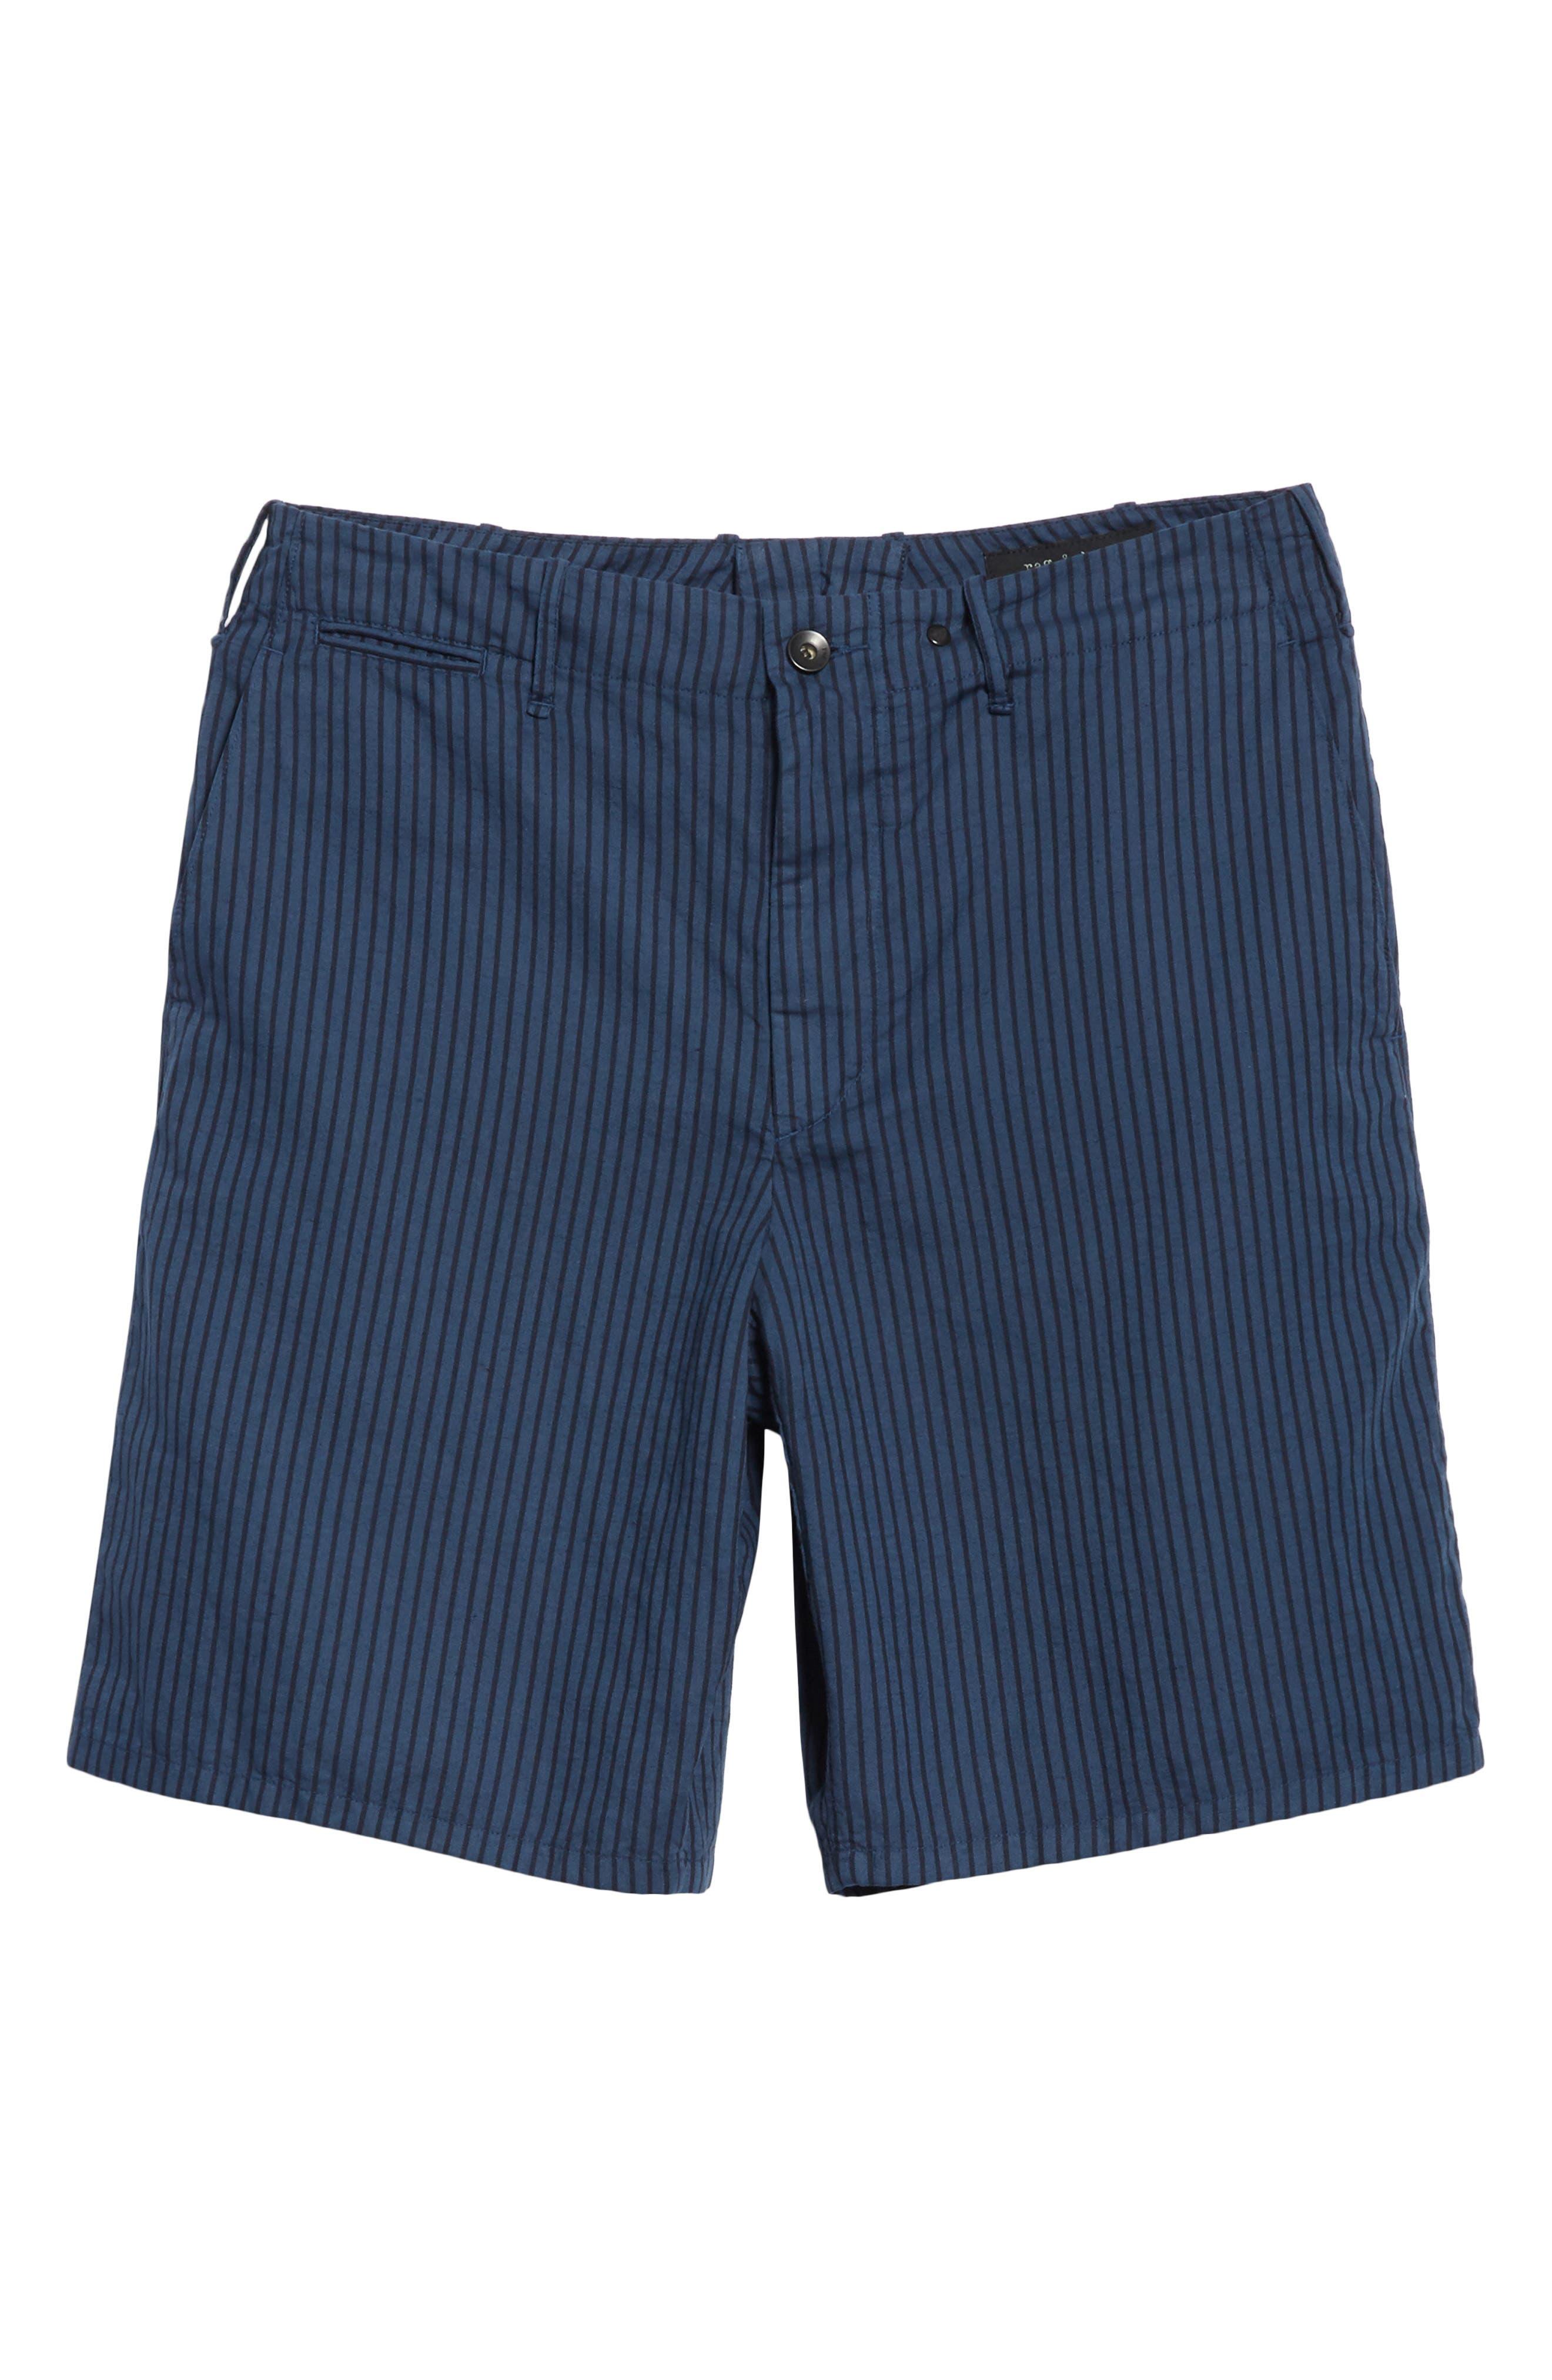 rag + bone Stripe Shorts,                             Alternate thumbnail 6, color,                             416